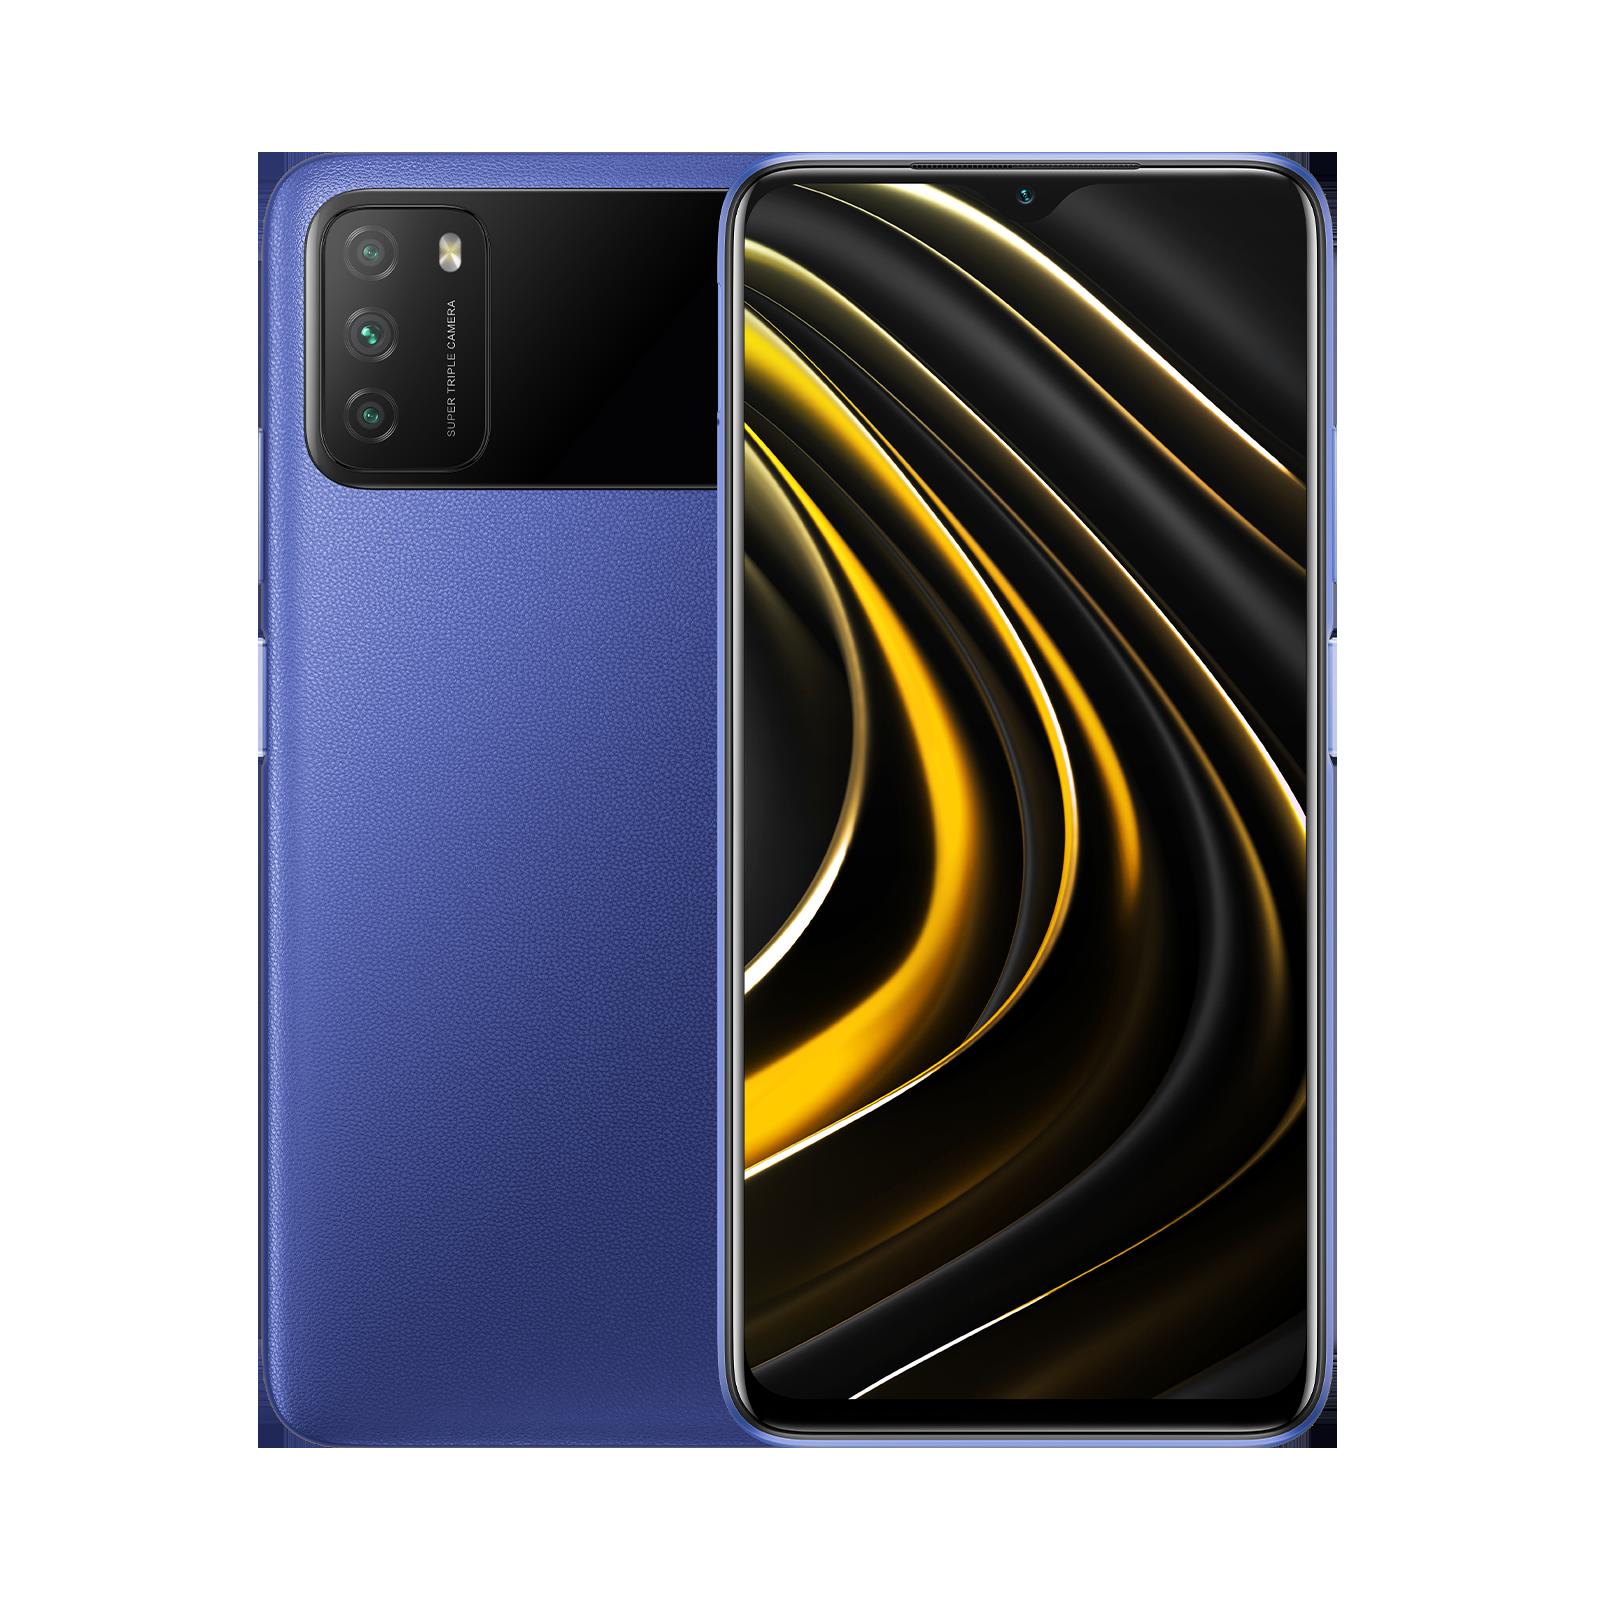 POCO M3 Cool Blue 4GB+64GB